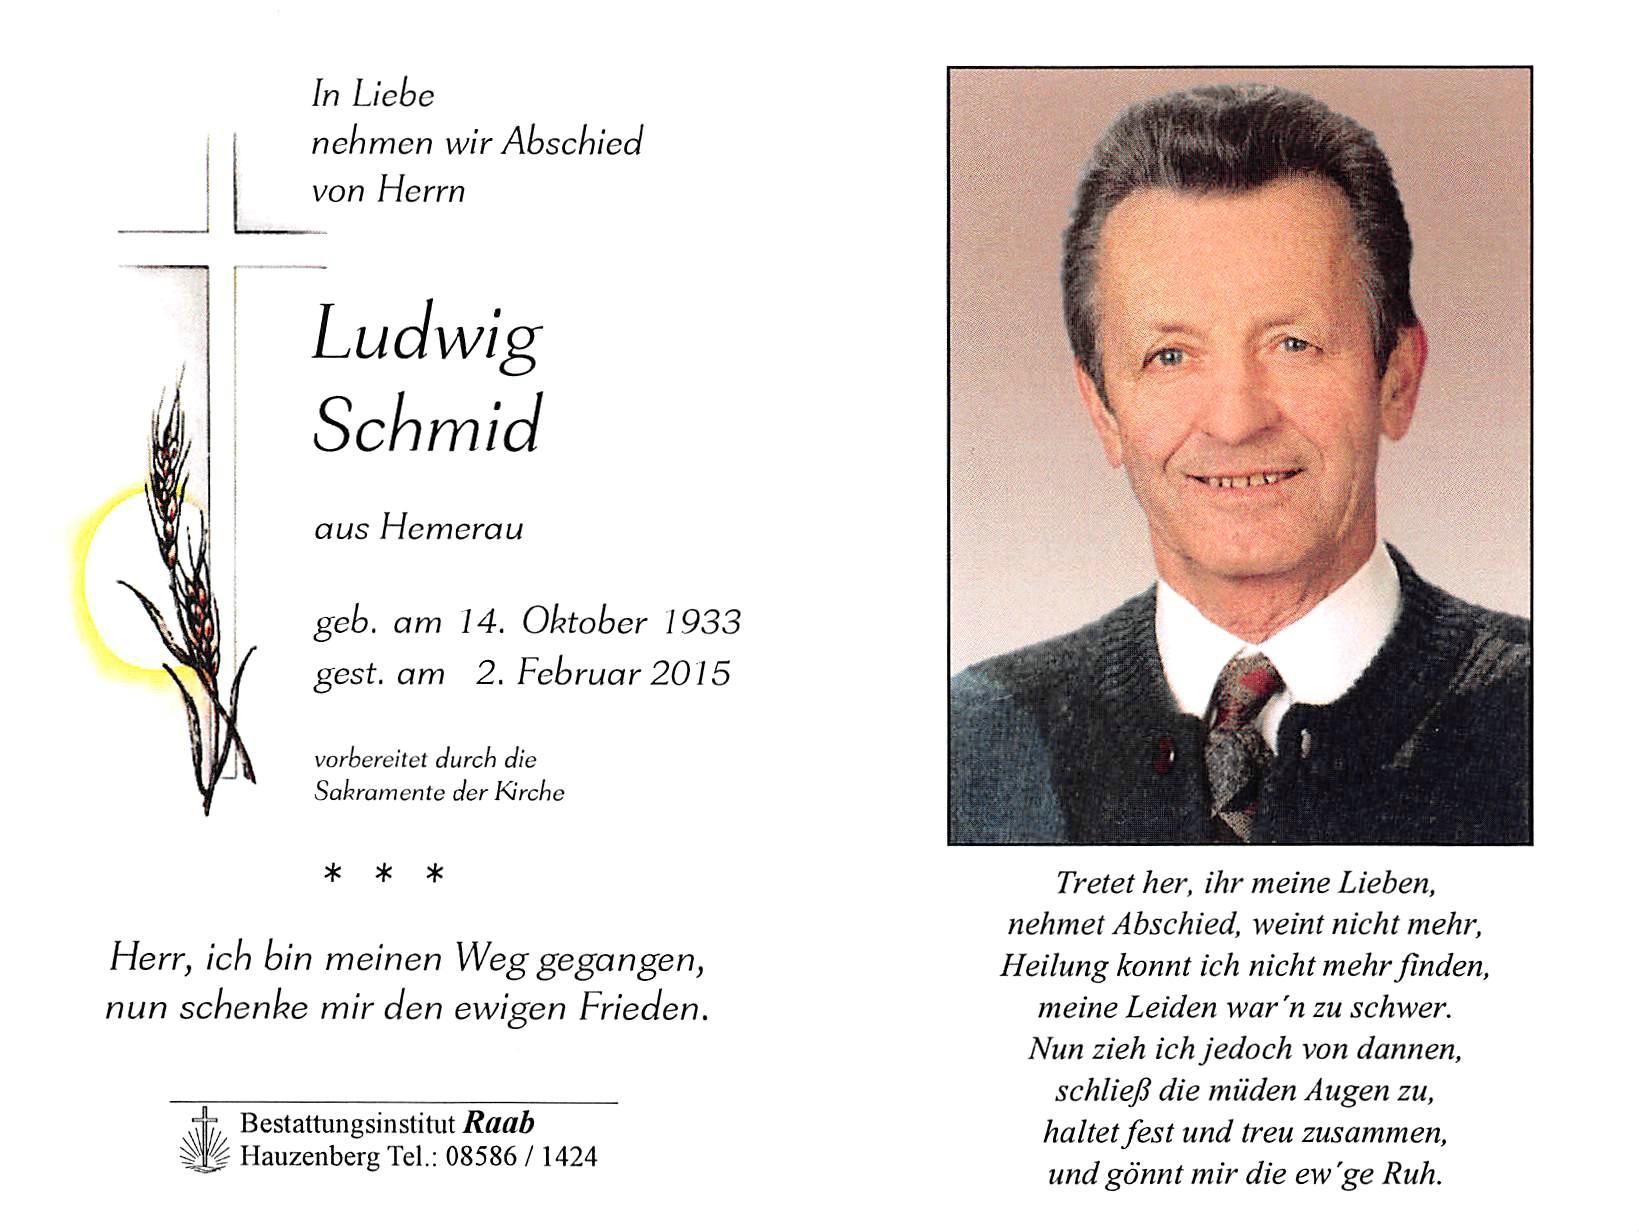 2015-02-02-Schmid-Ludwig-Hemerau-Zillewigg